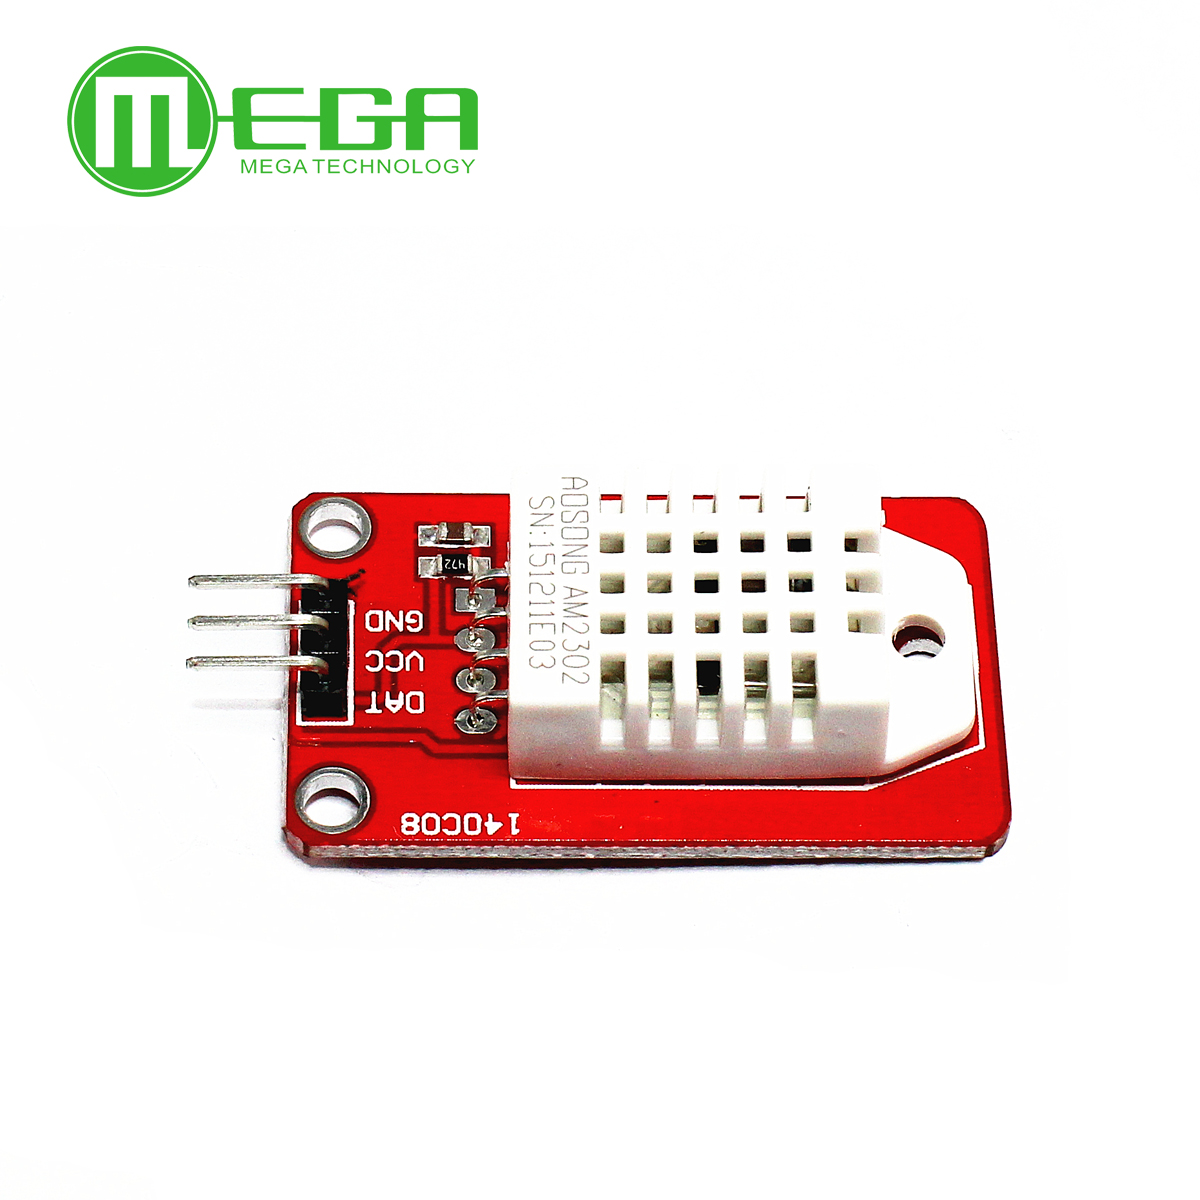 Hohe Präzision AM2302 DHT22 Digitale Temperatur Feuchtigkeit Sensor Modul Für Uno R3